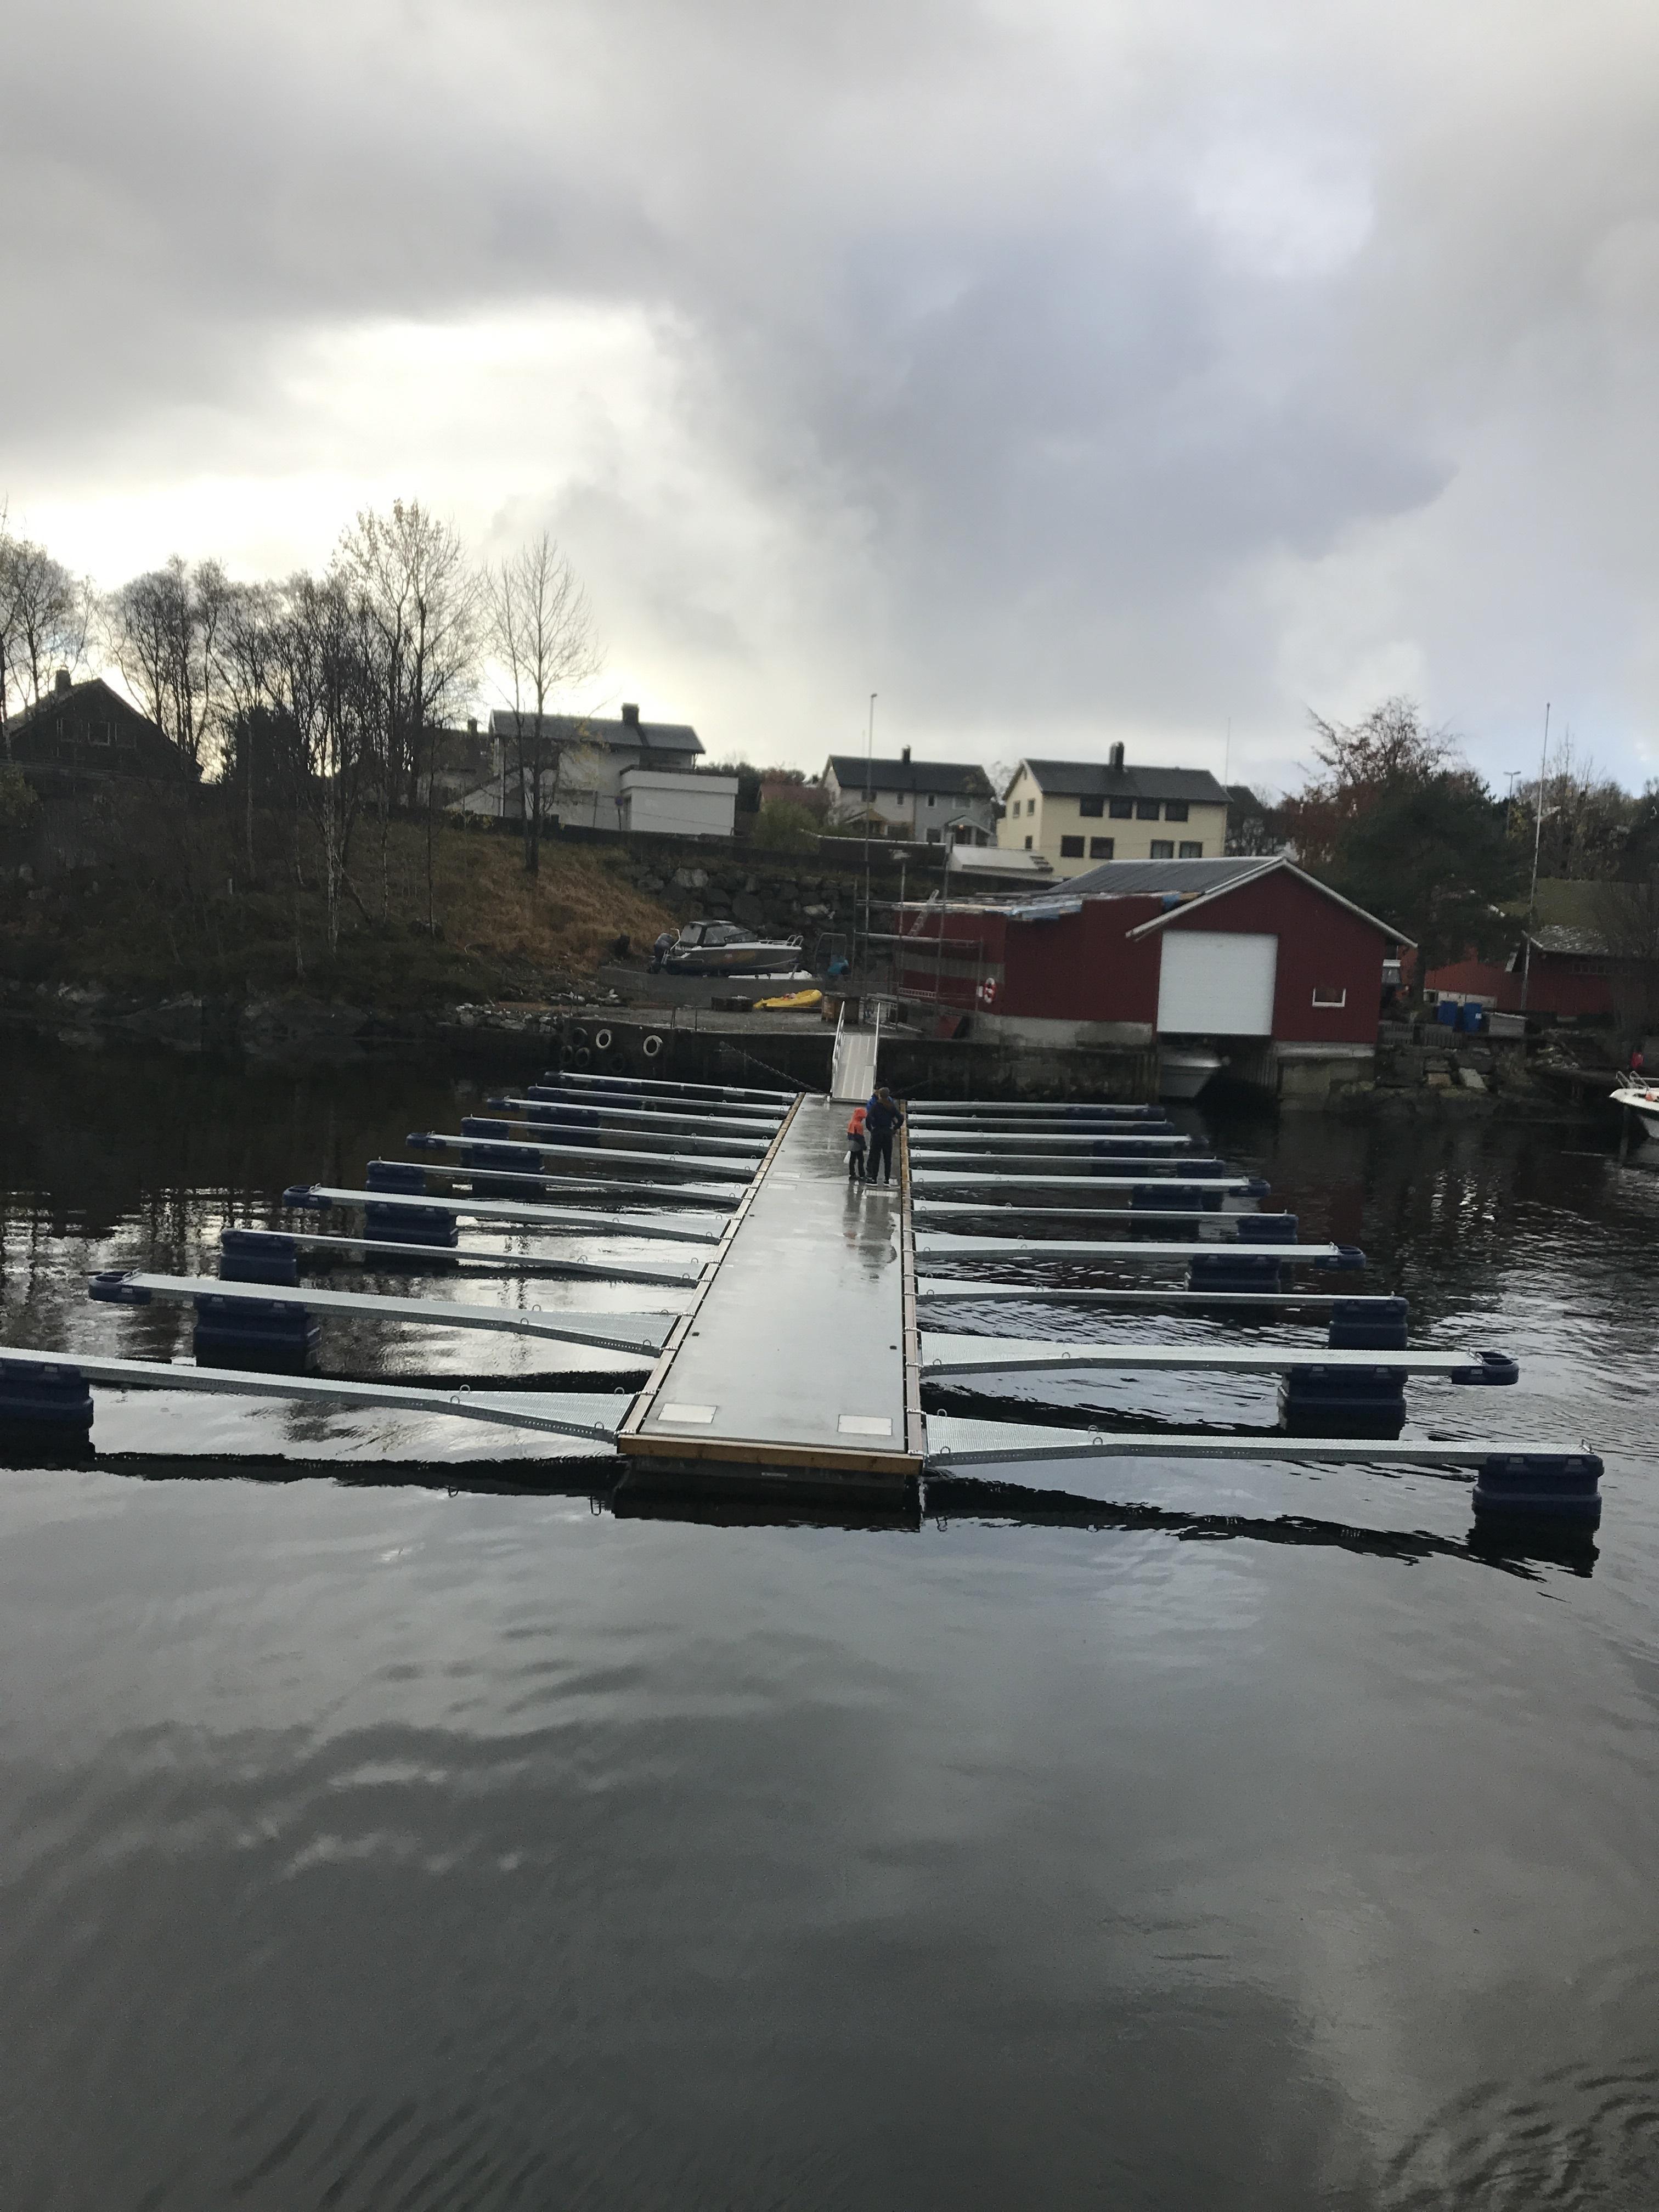 https://www.marinasolutions.no/uploads/Jarle-Tonheim-Florø-marina-solutions-3.JPG